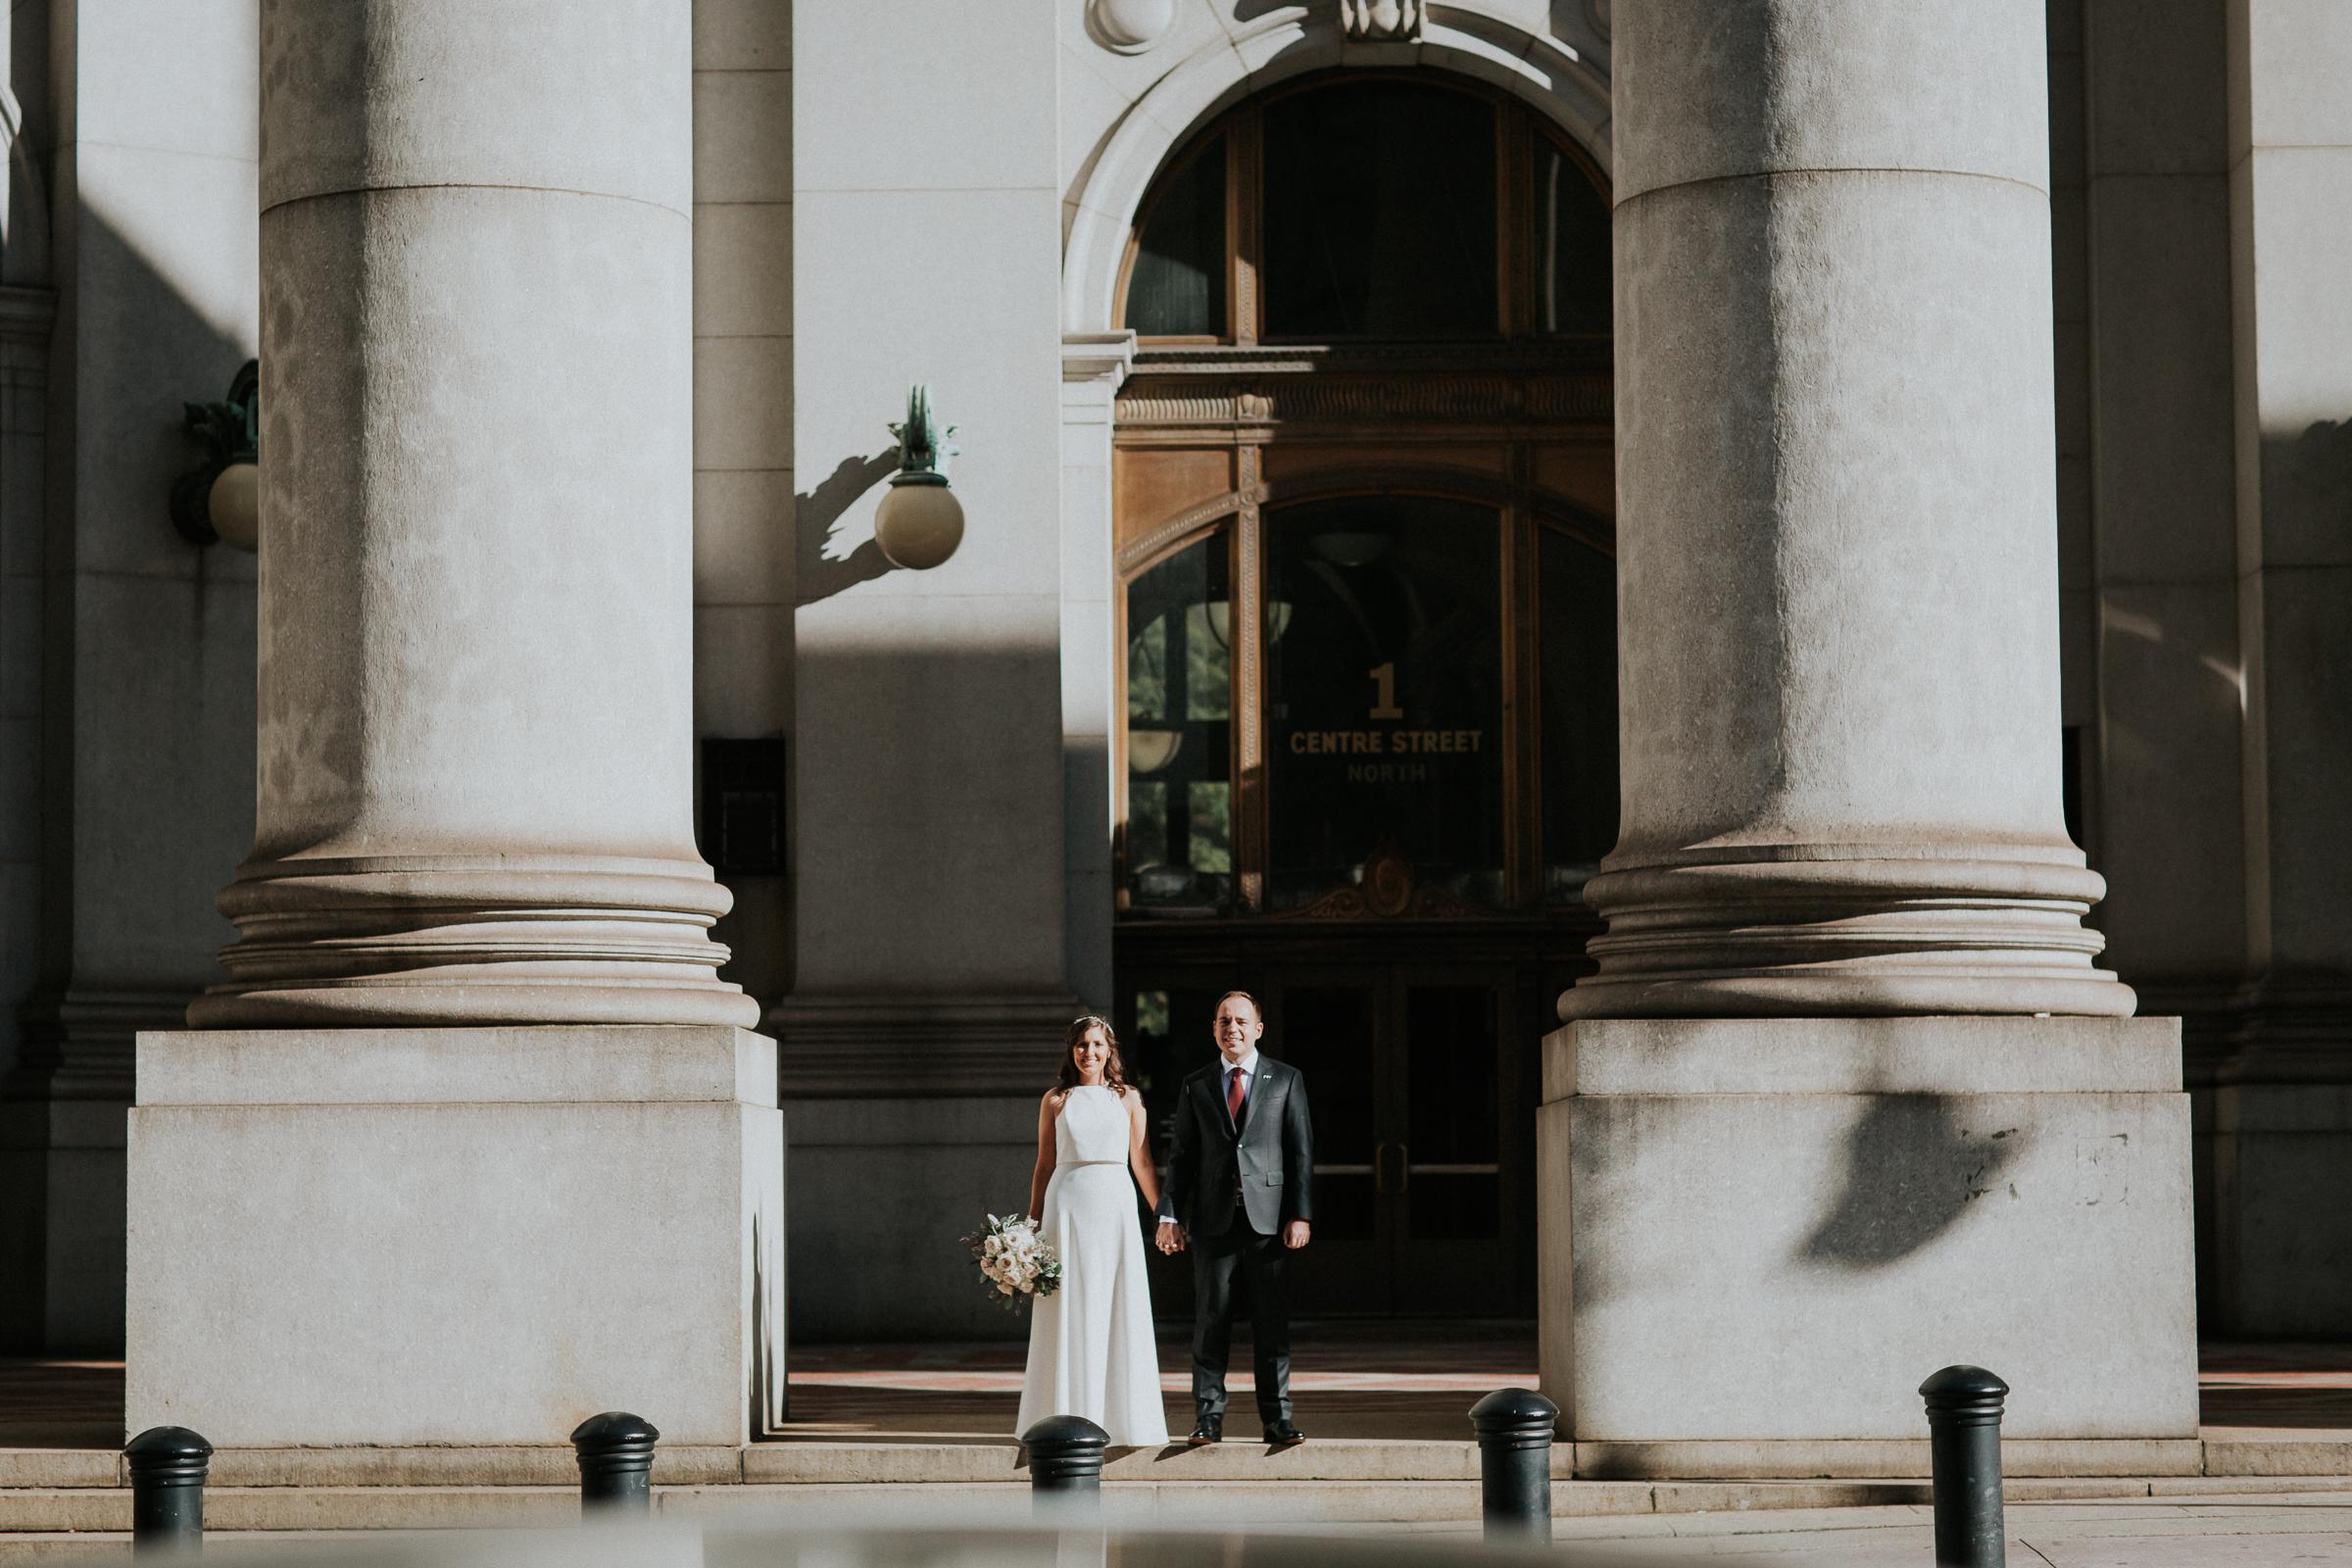 Casa-Apicii-Intimate-Wedding-City-Hall-Elopement-New-York-Documentary-Wedding-Photographer-18.jpg